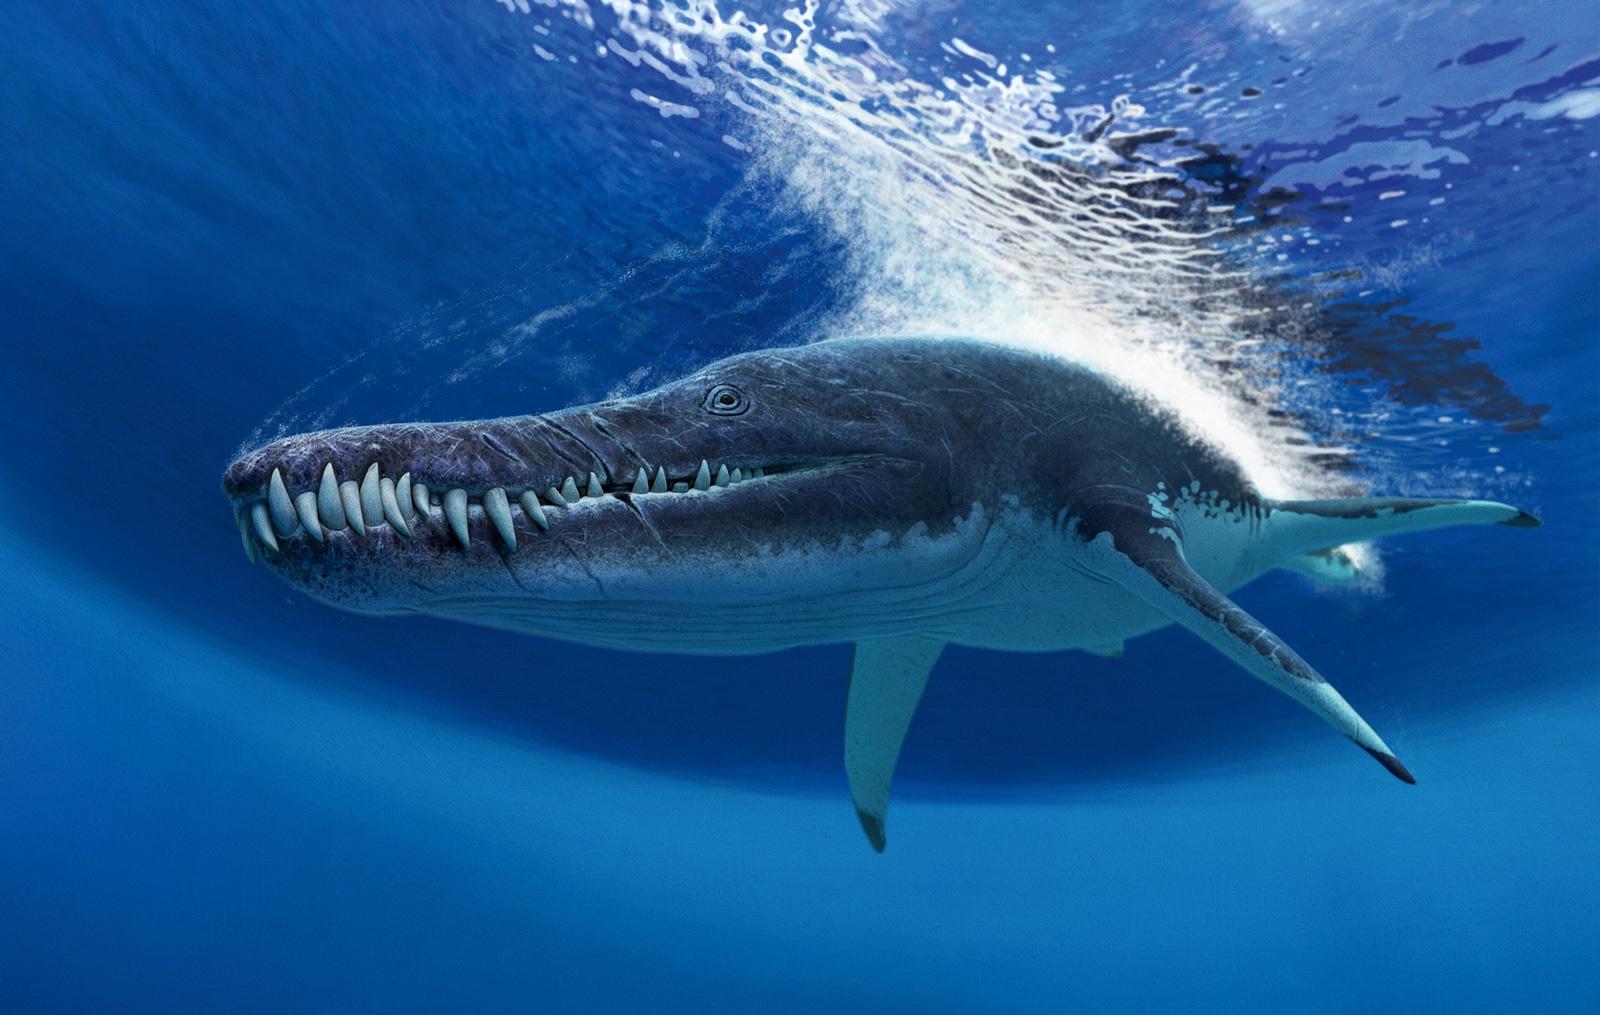 gigantic_pliosaurid_from_volga_region_1_1600